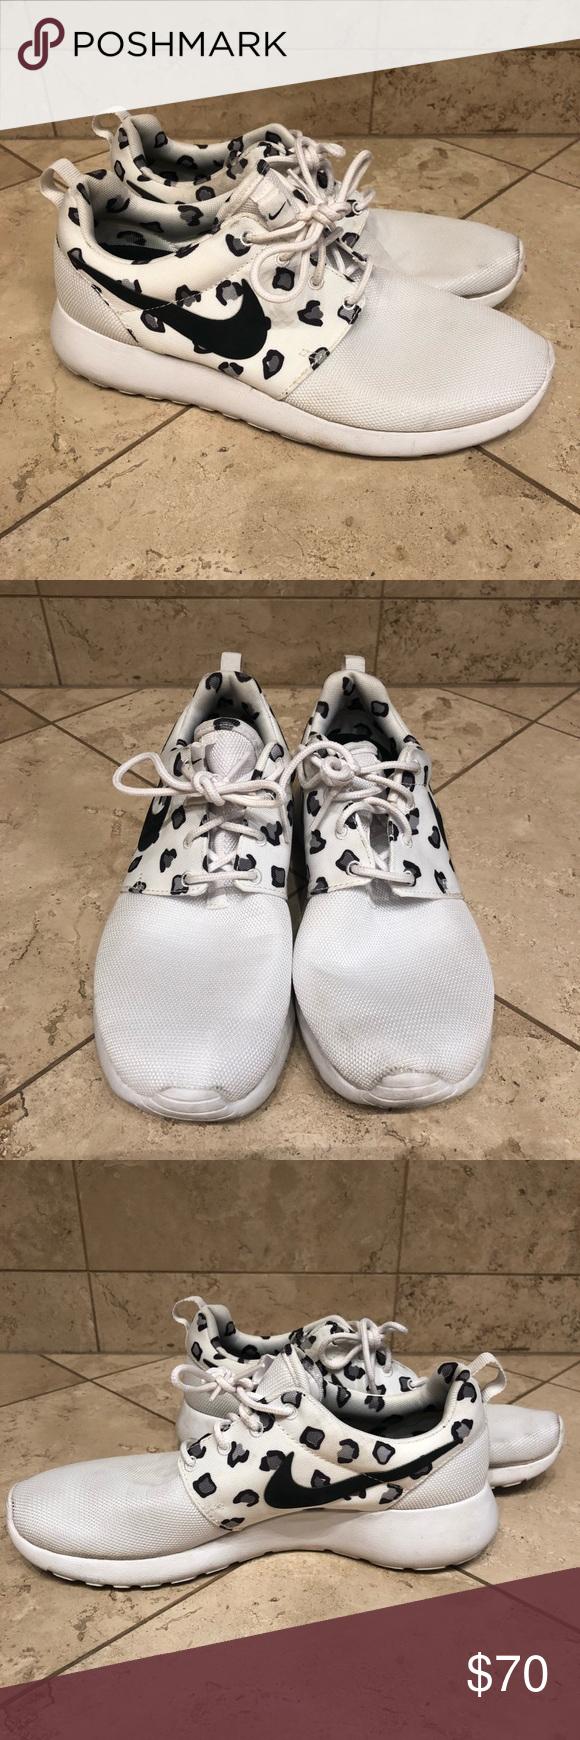 Nike Roshe Run White Leopard Print Sneakers Leopard